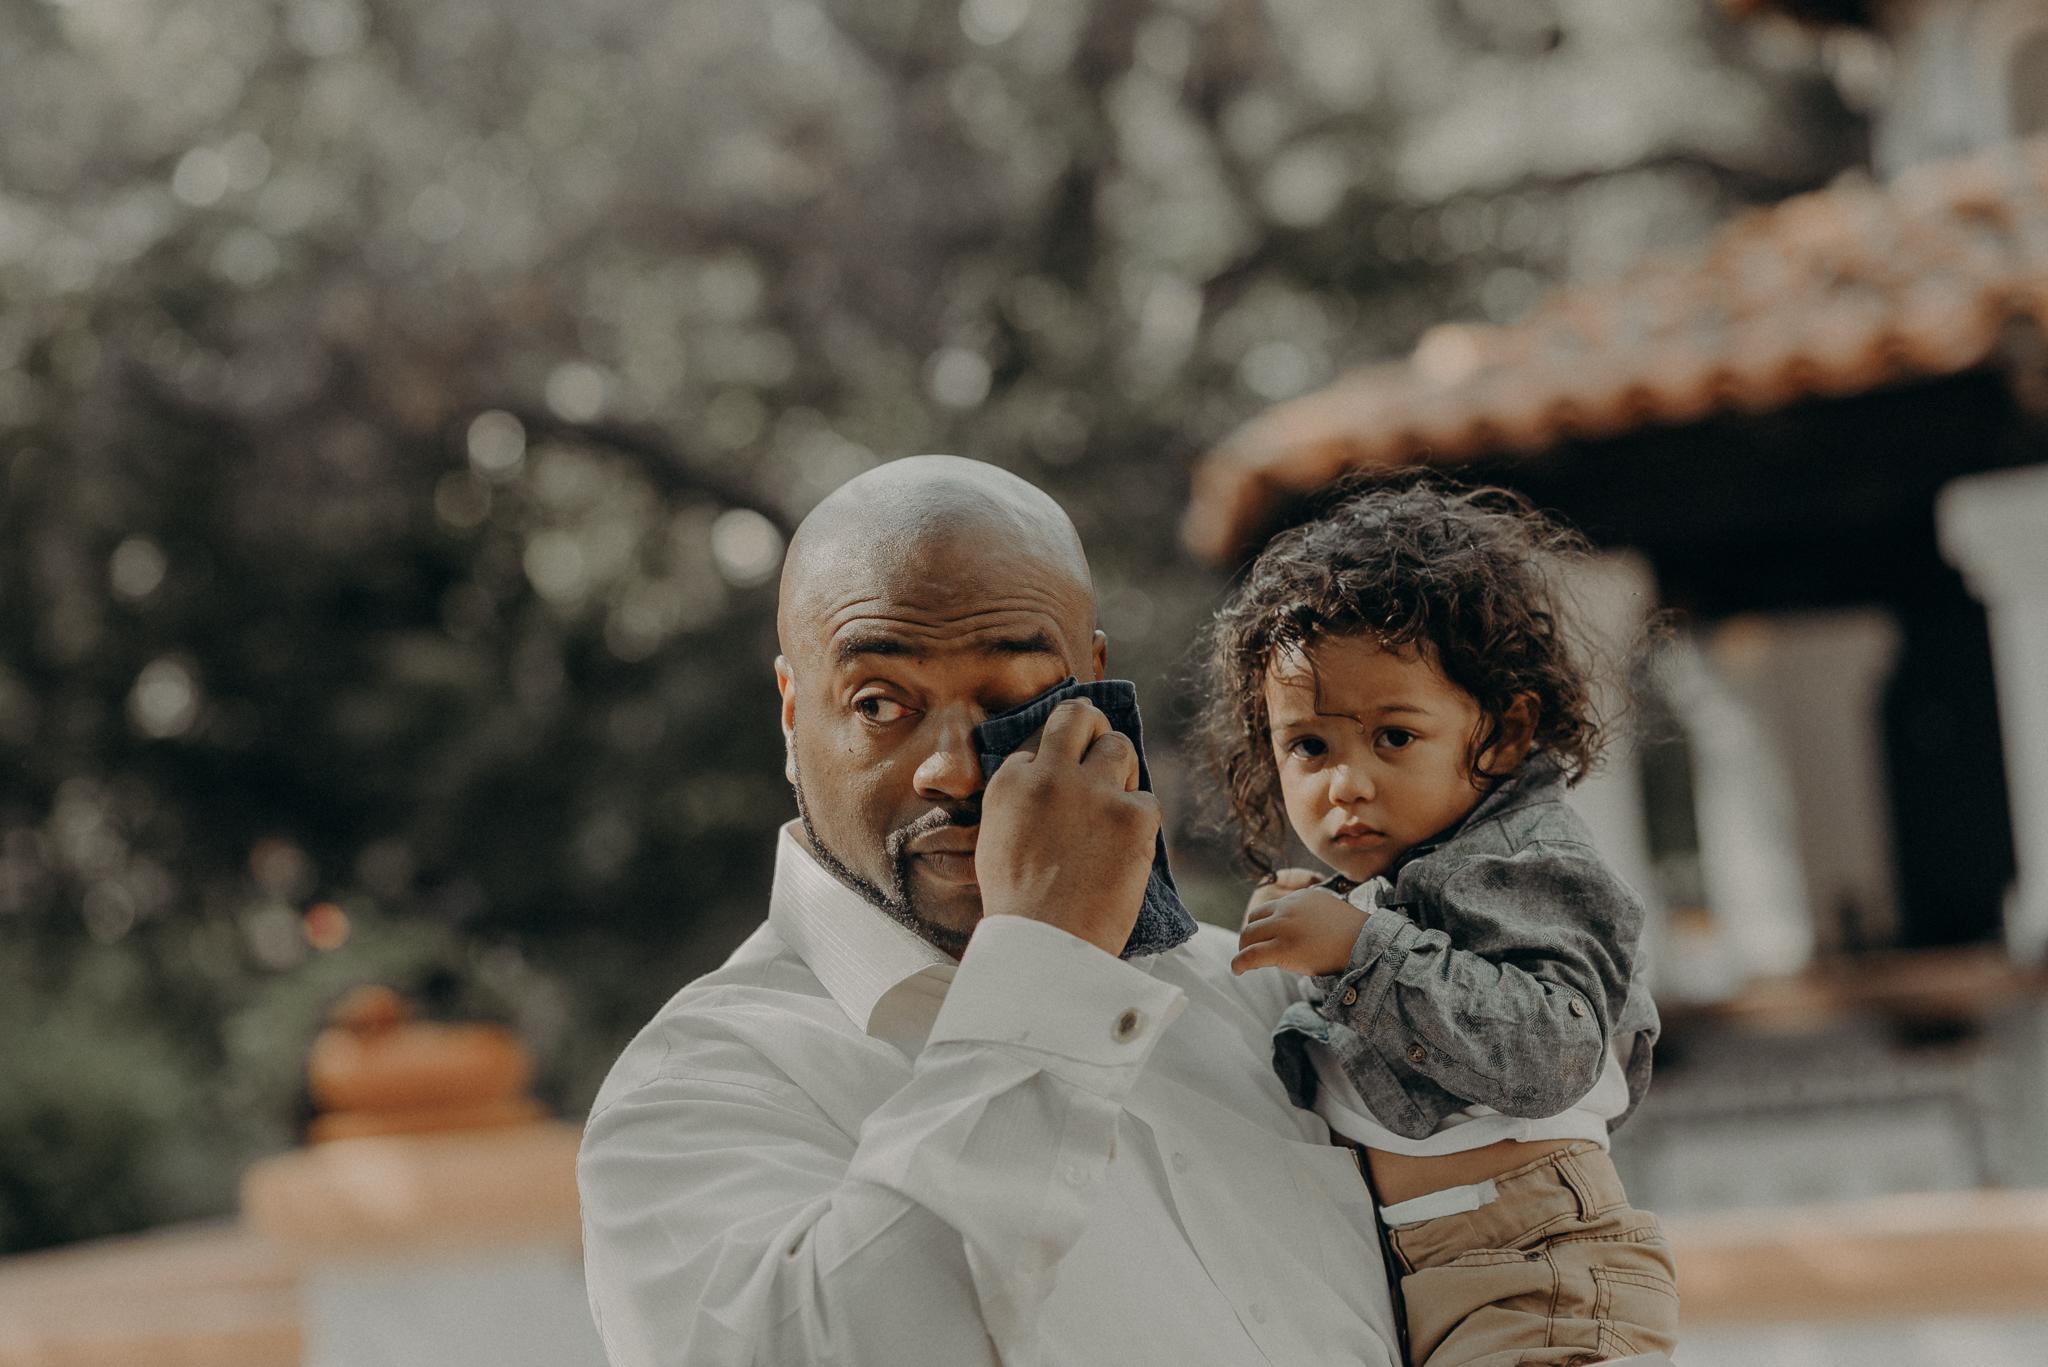 Isaiah + Taylor Photography - Rancho Las Lomas Wedding, Los Angeles Wedding Photographer-054.jpg